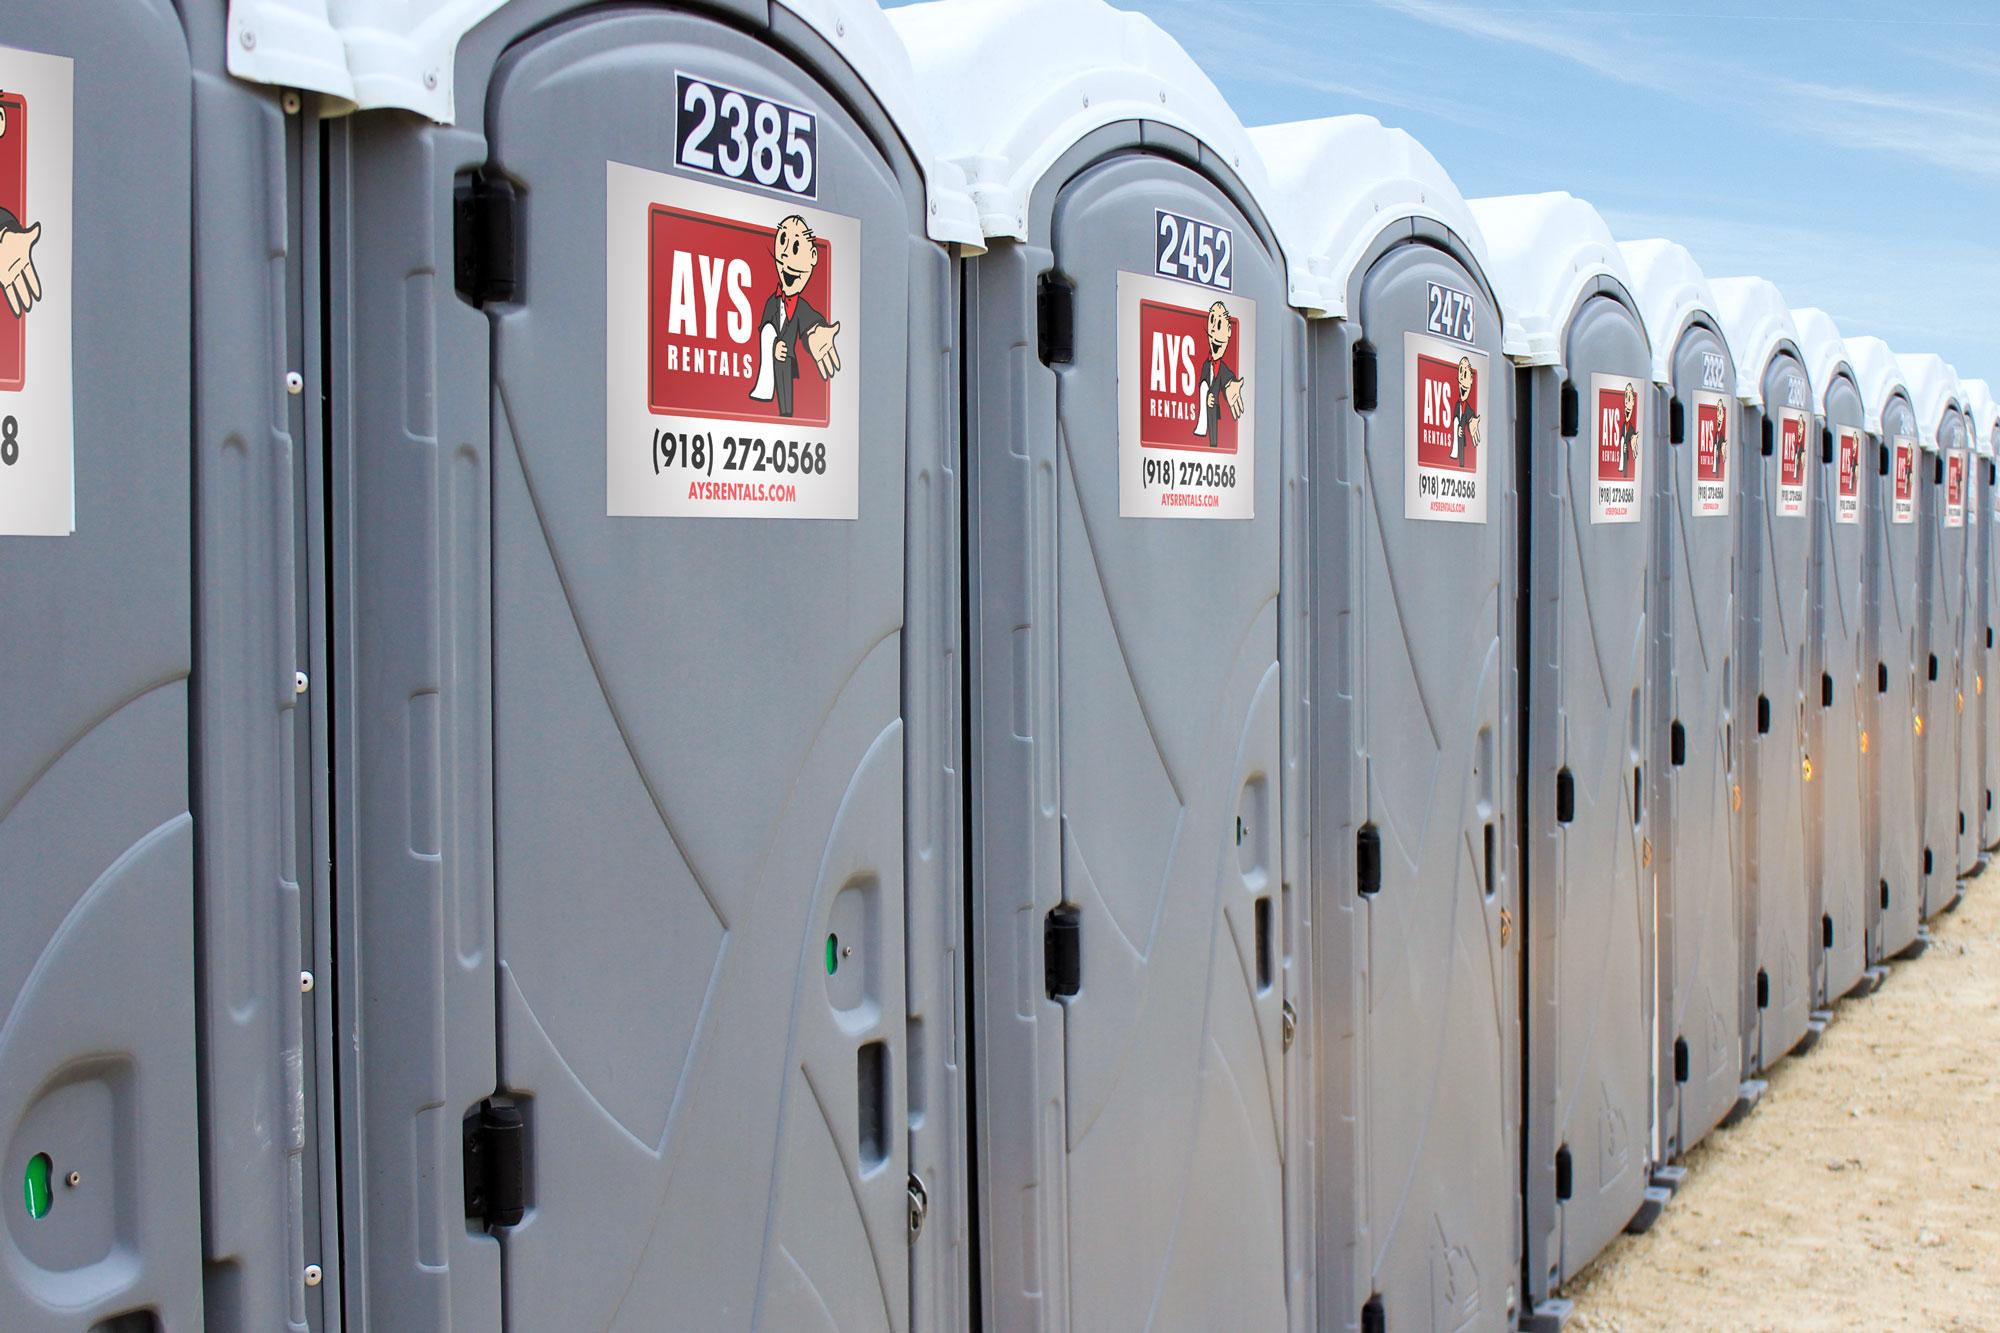 Porta Potty Rentals | AYS OKC - Tulsa